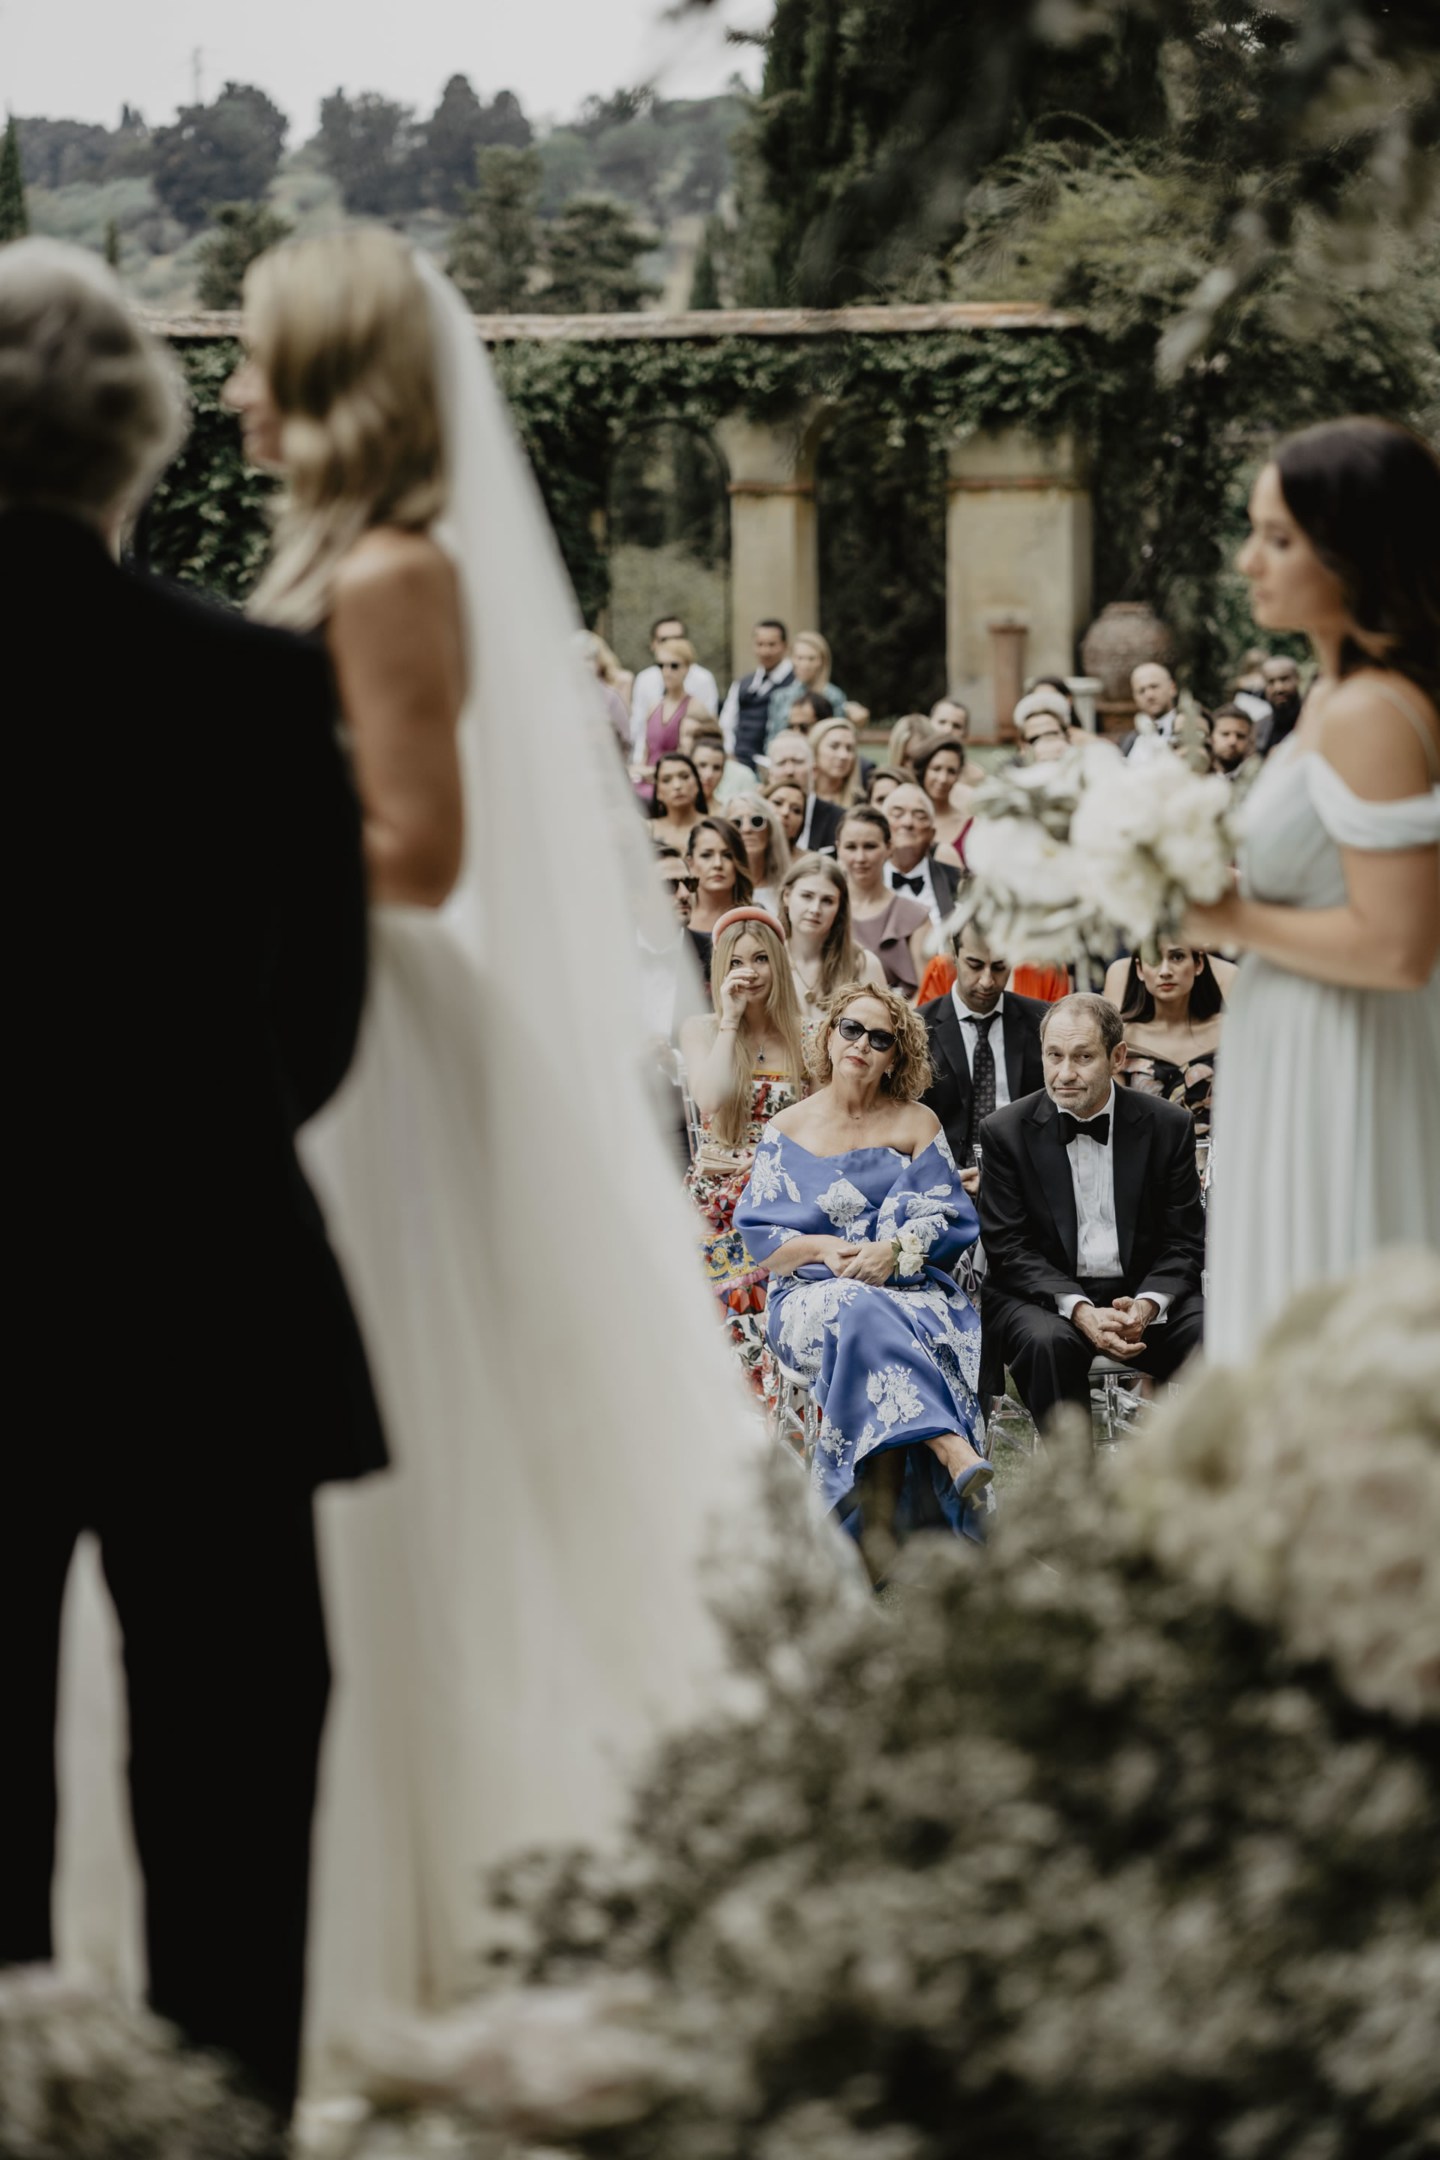 A sparkling wedding in the shore of the Arno - 42 :: A sparkling wedding on the shore of the Arno :: Luxury wedding photography - 41 :: A sparkling wedding in the shore of the Arno - 42